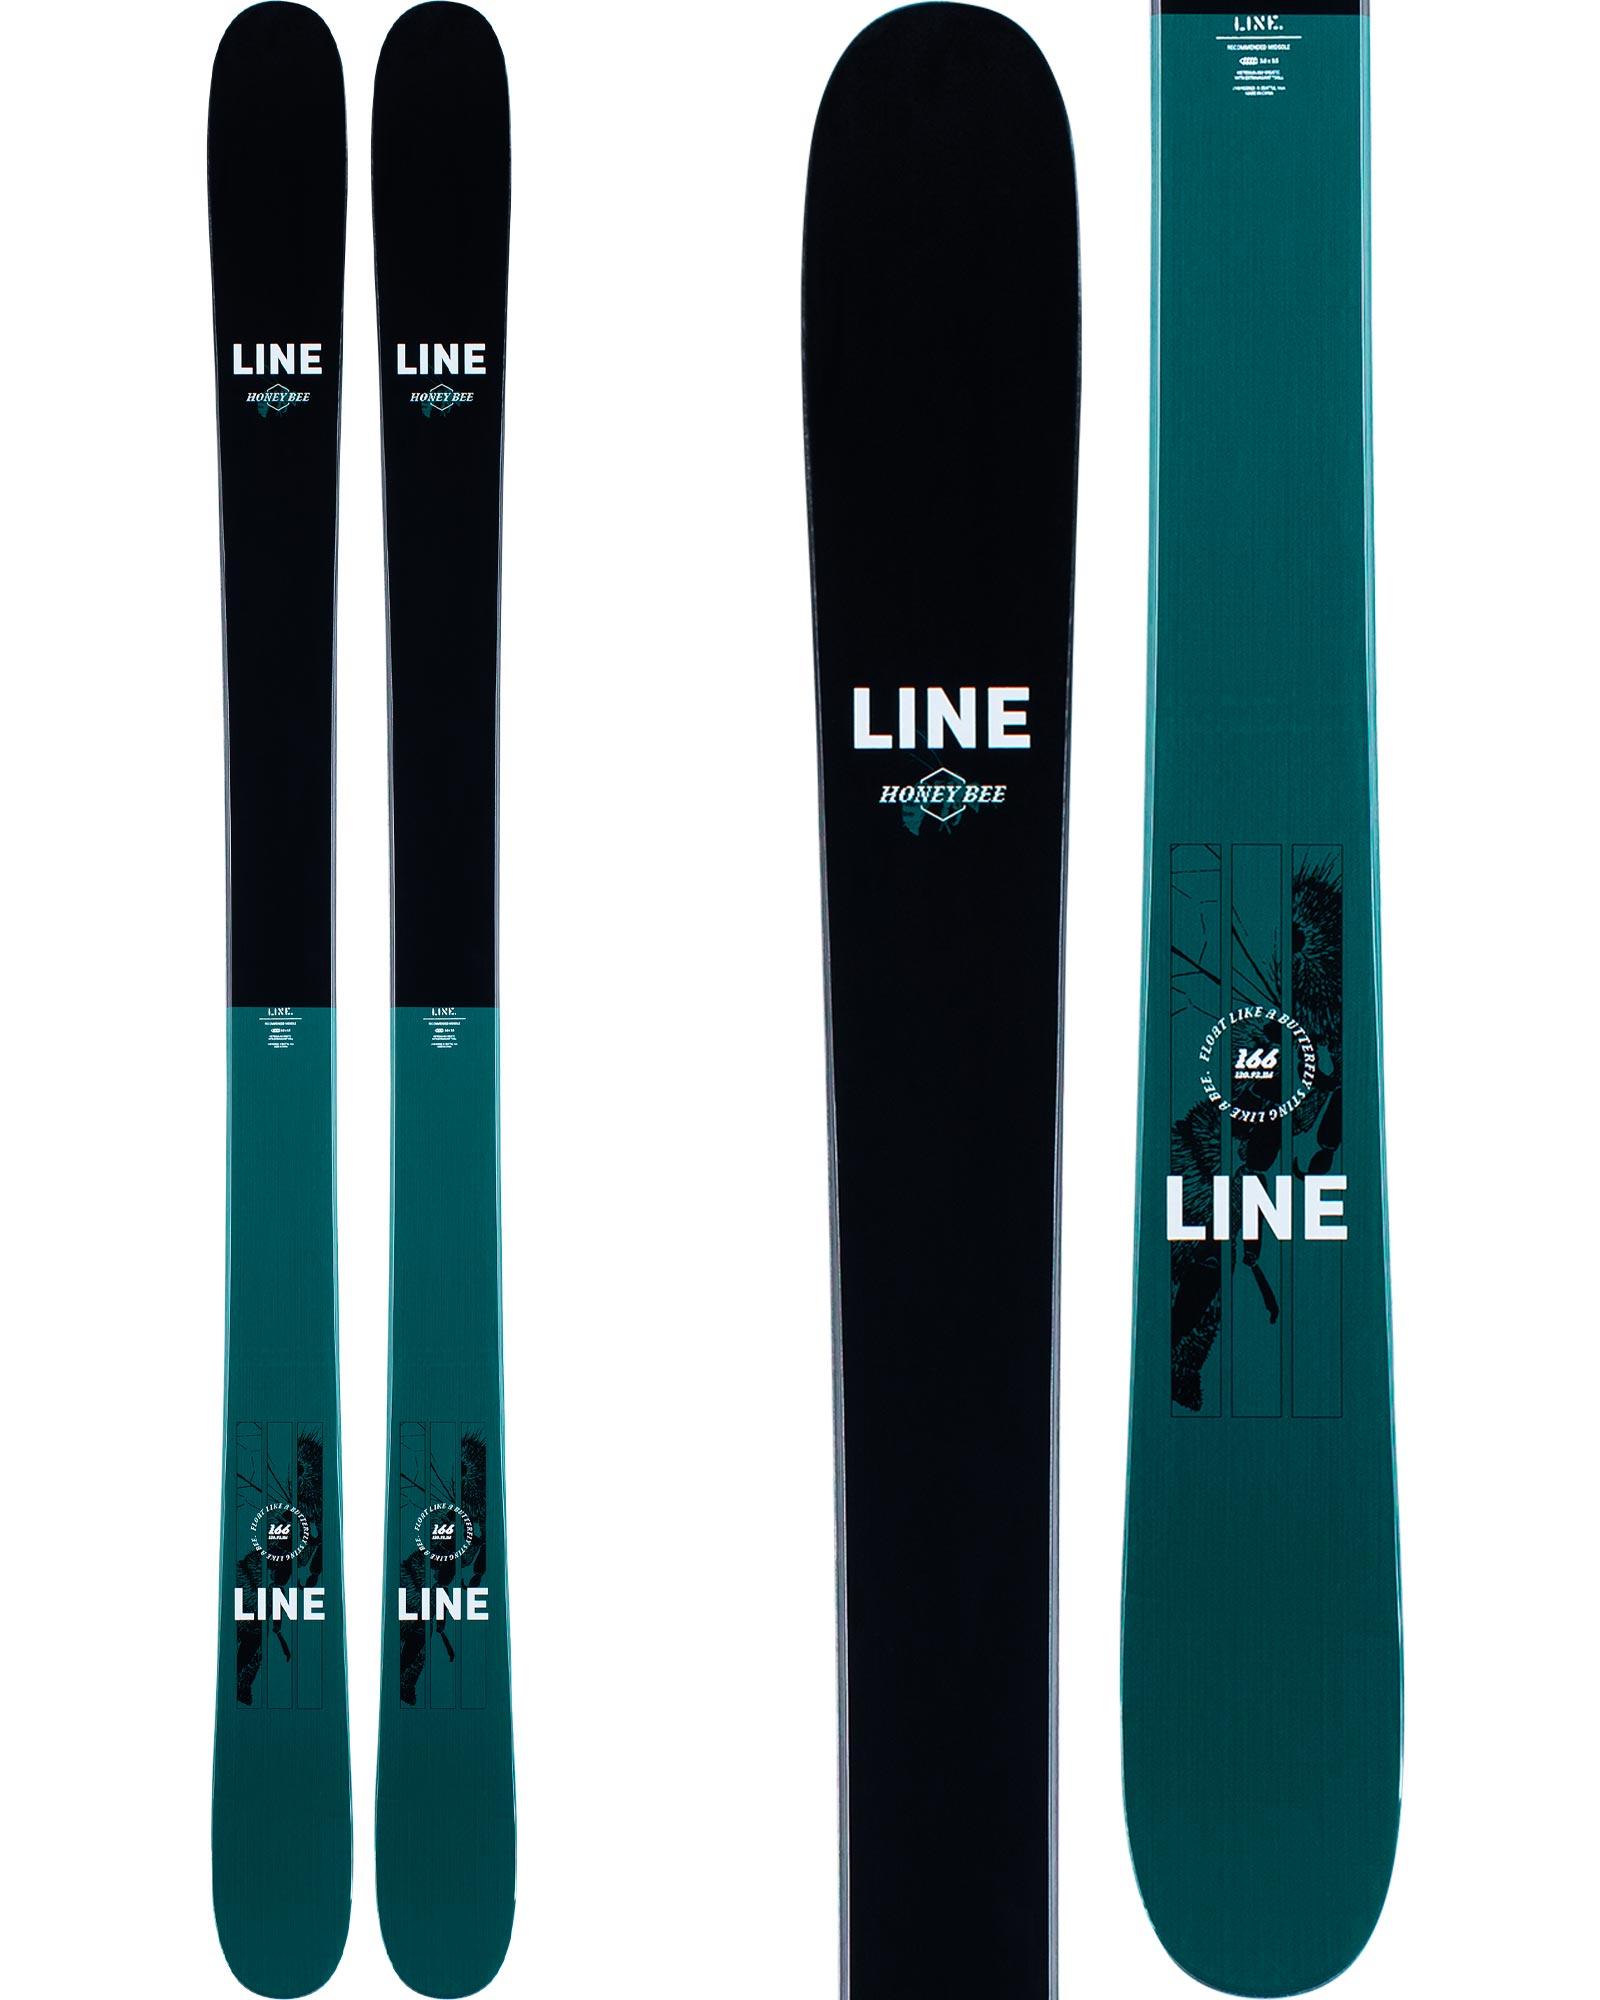 Line Women's Honey Bee Freestyle Skis 2020 / 2021 0